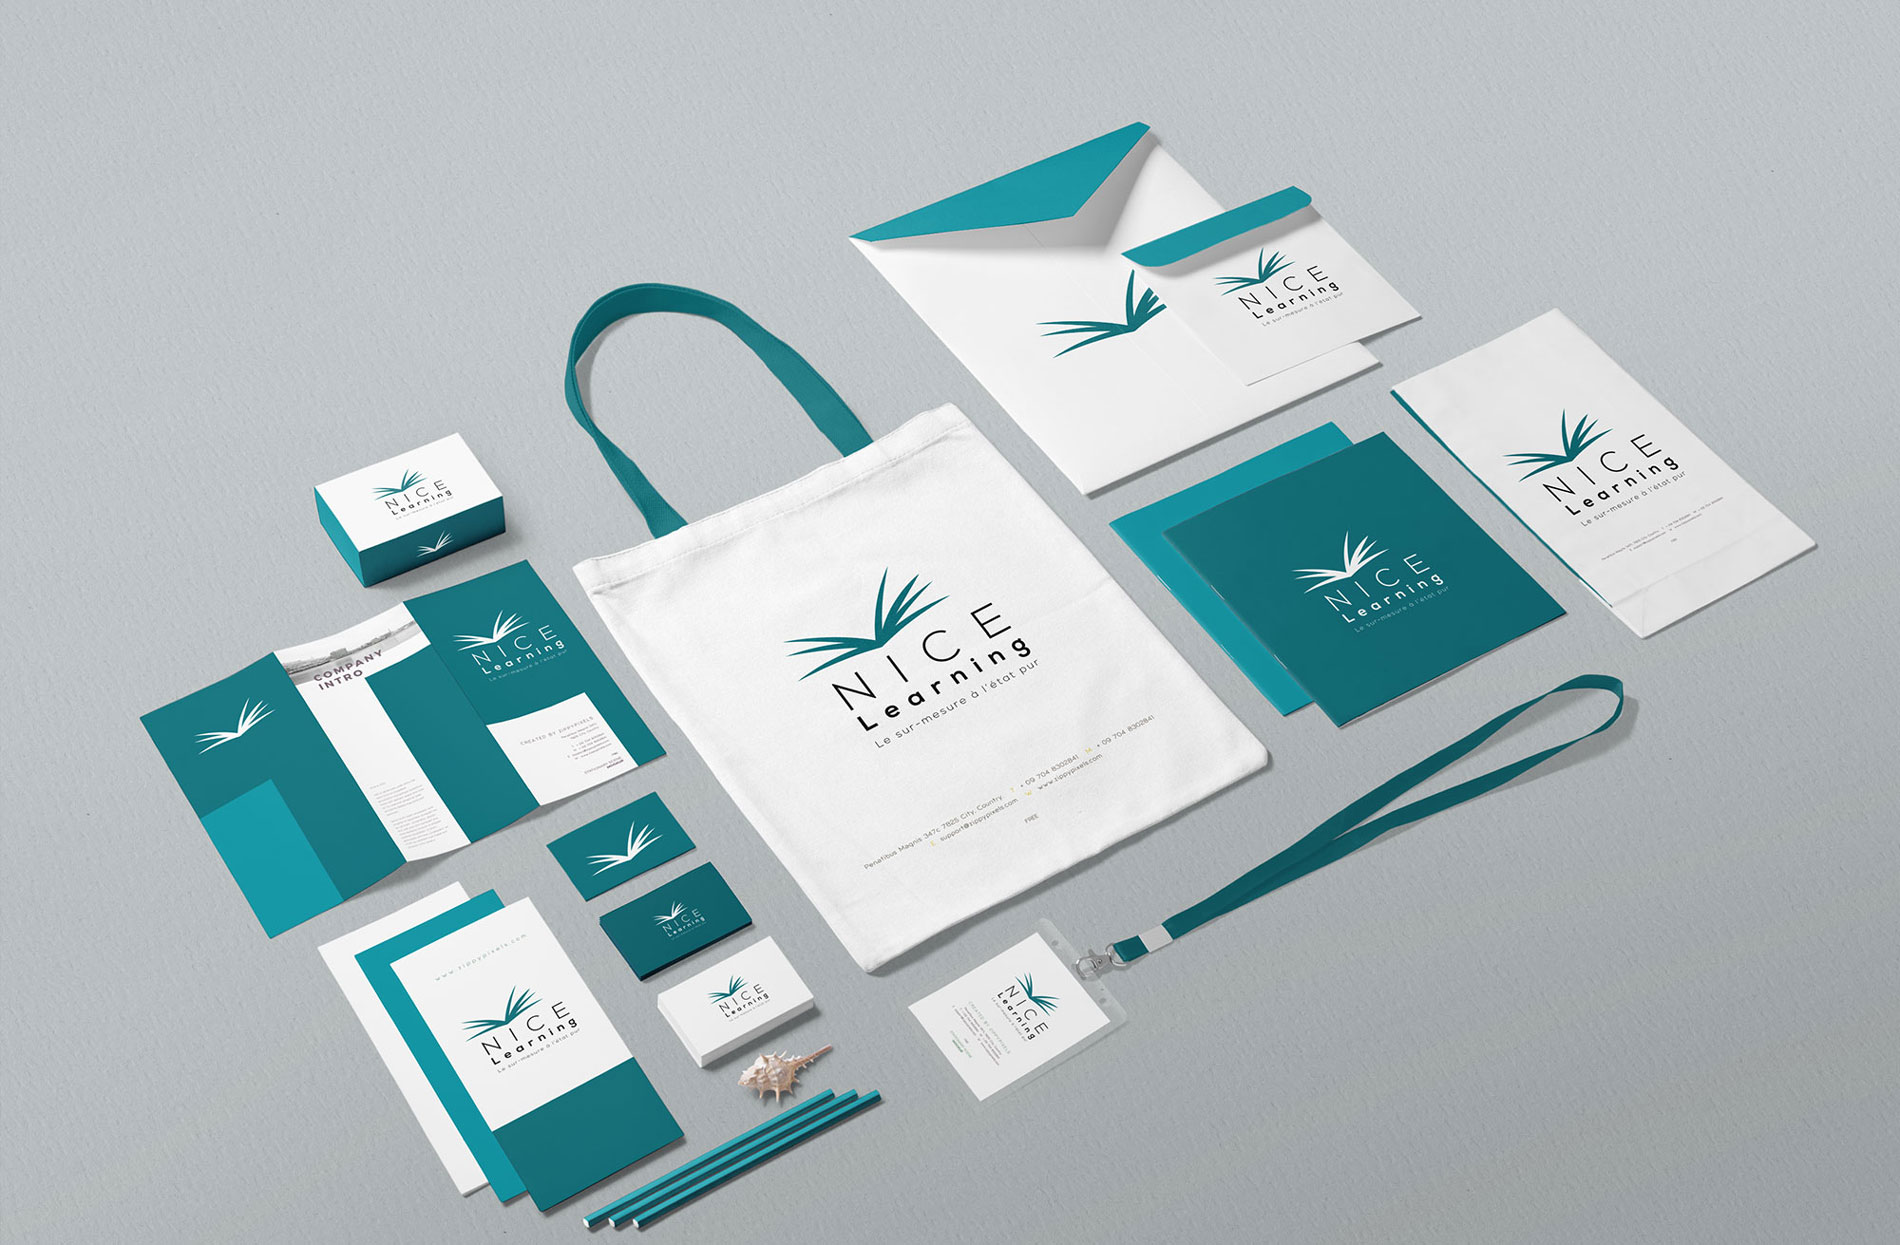 ikadia-portfolio-nice-learning-2